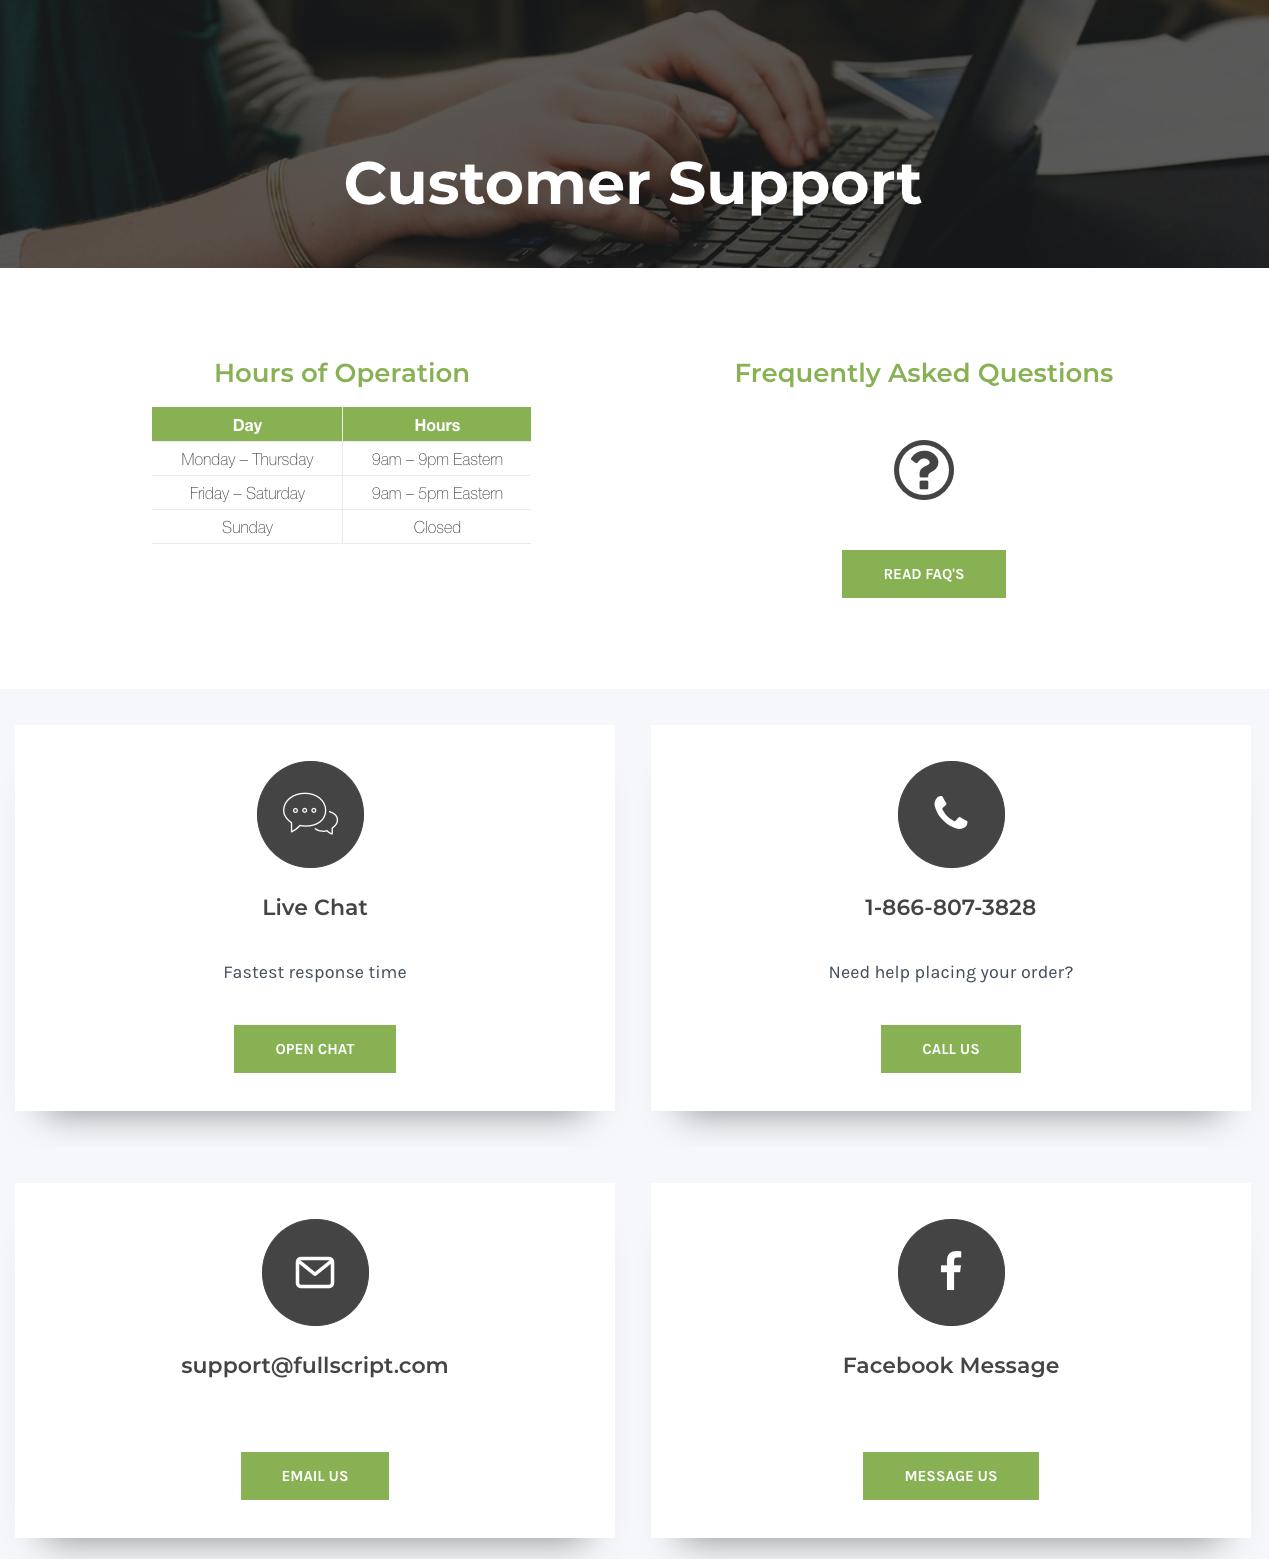 Fullscript's support webpage